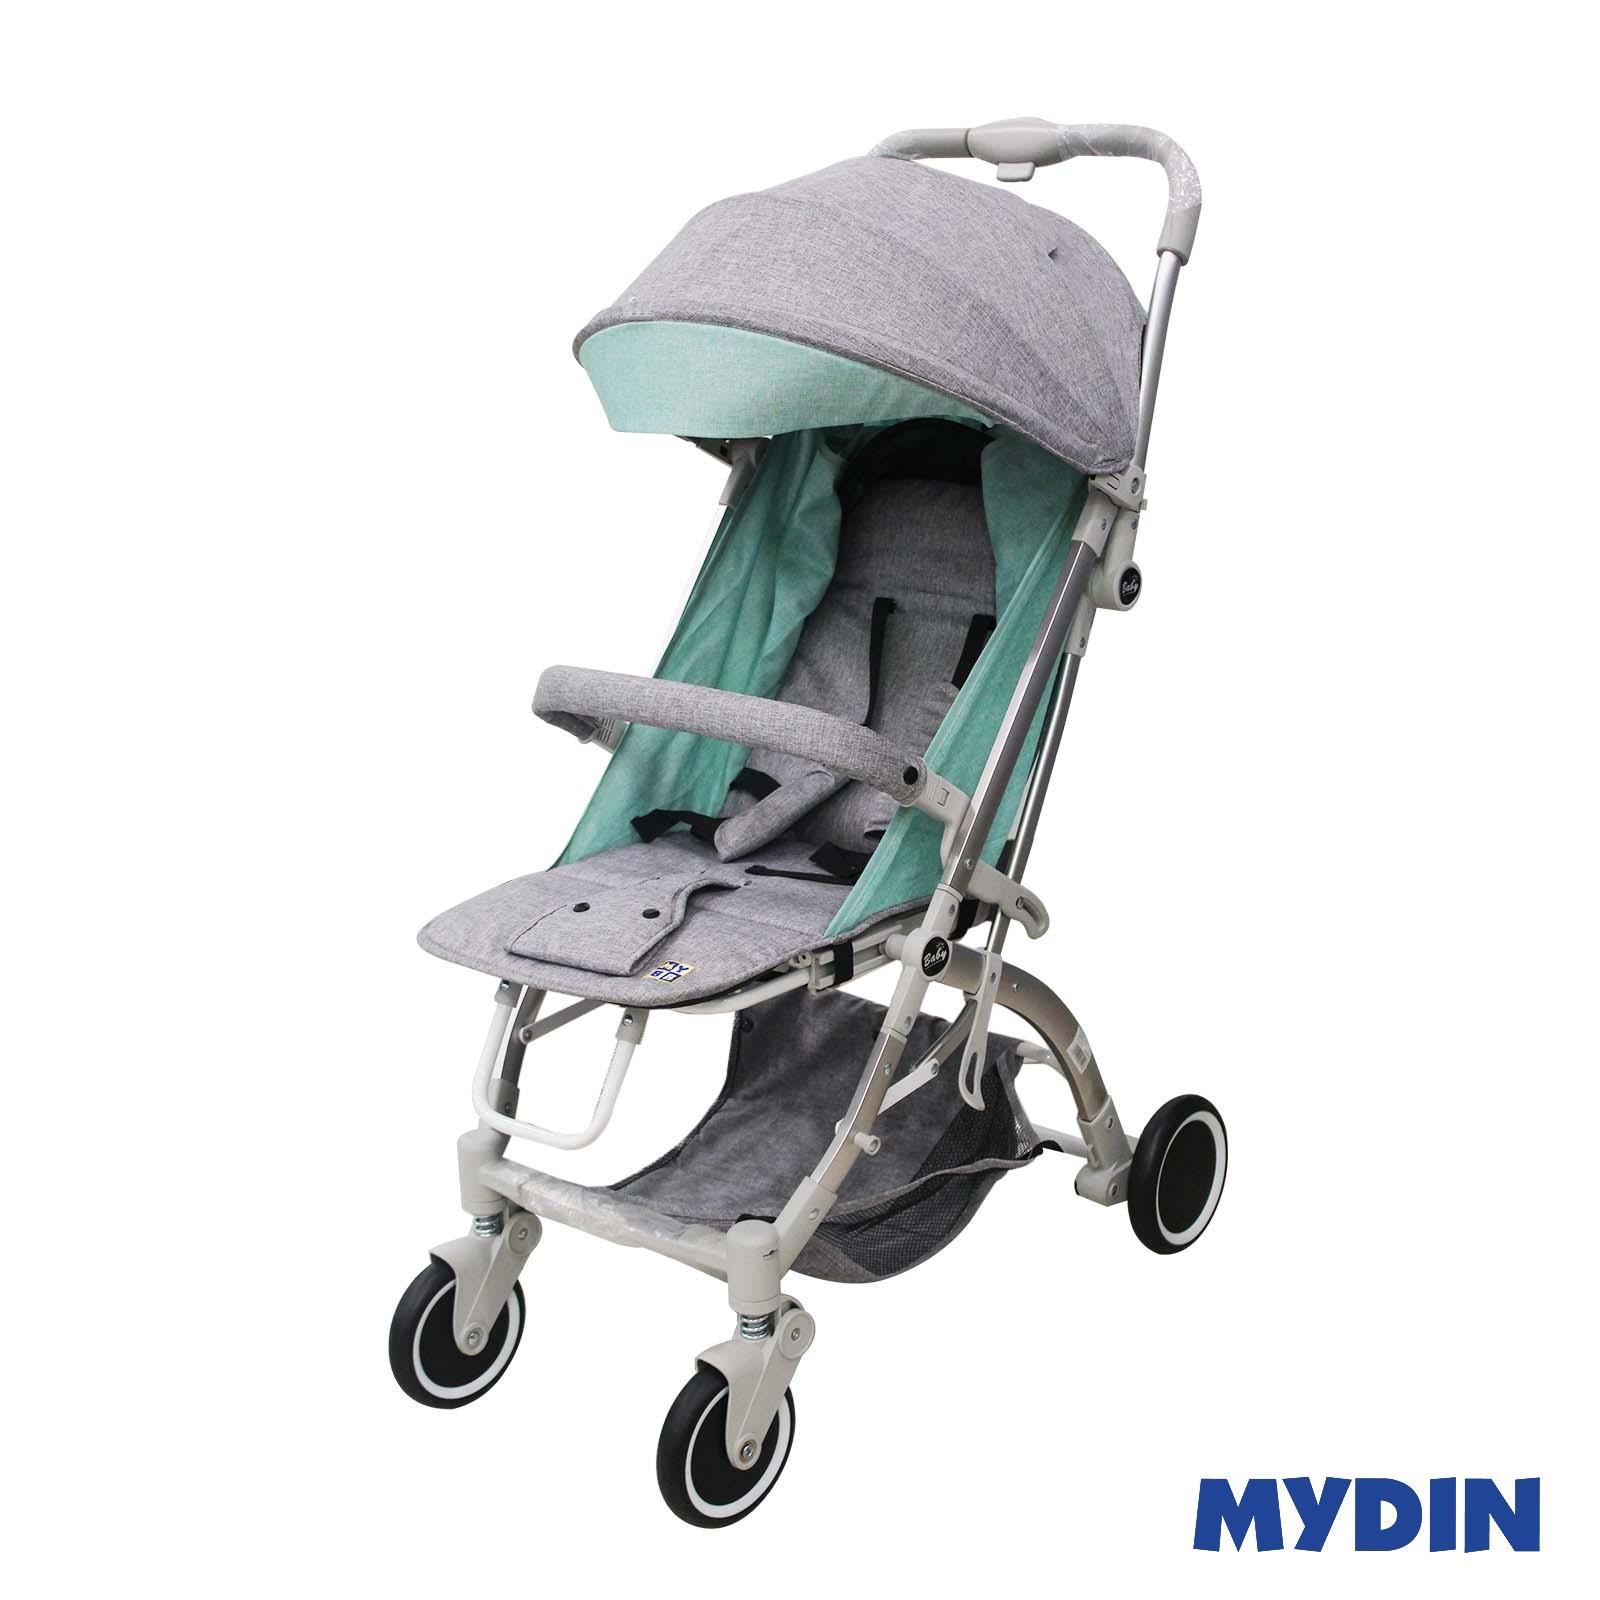 MYBB Baby Stroller Green 0518FLSTTP02A